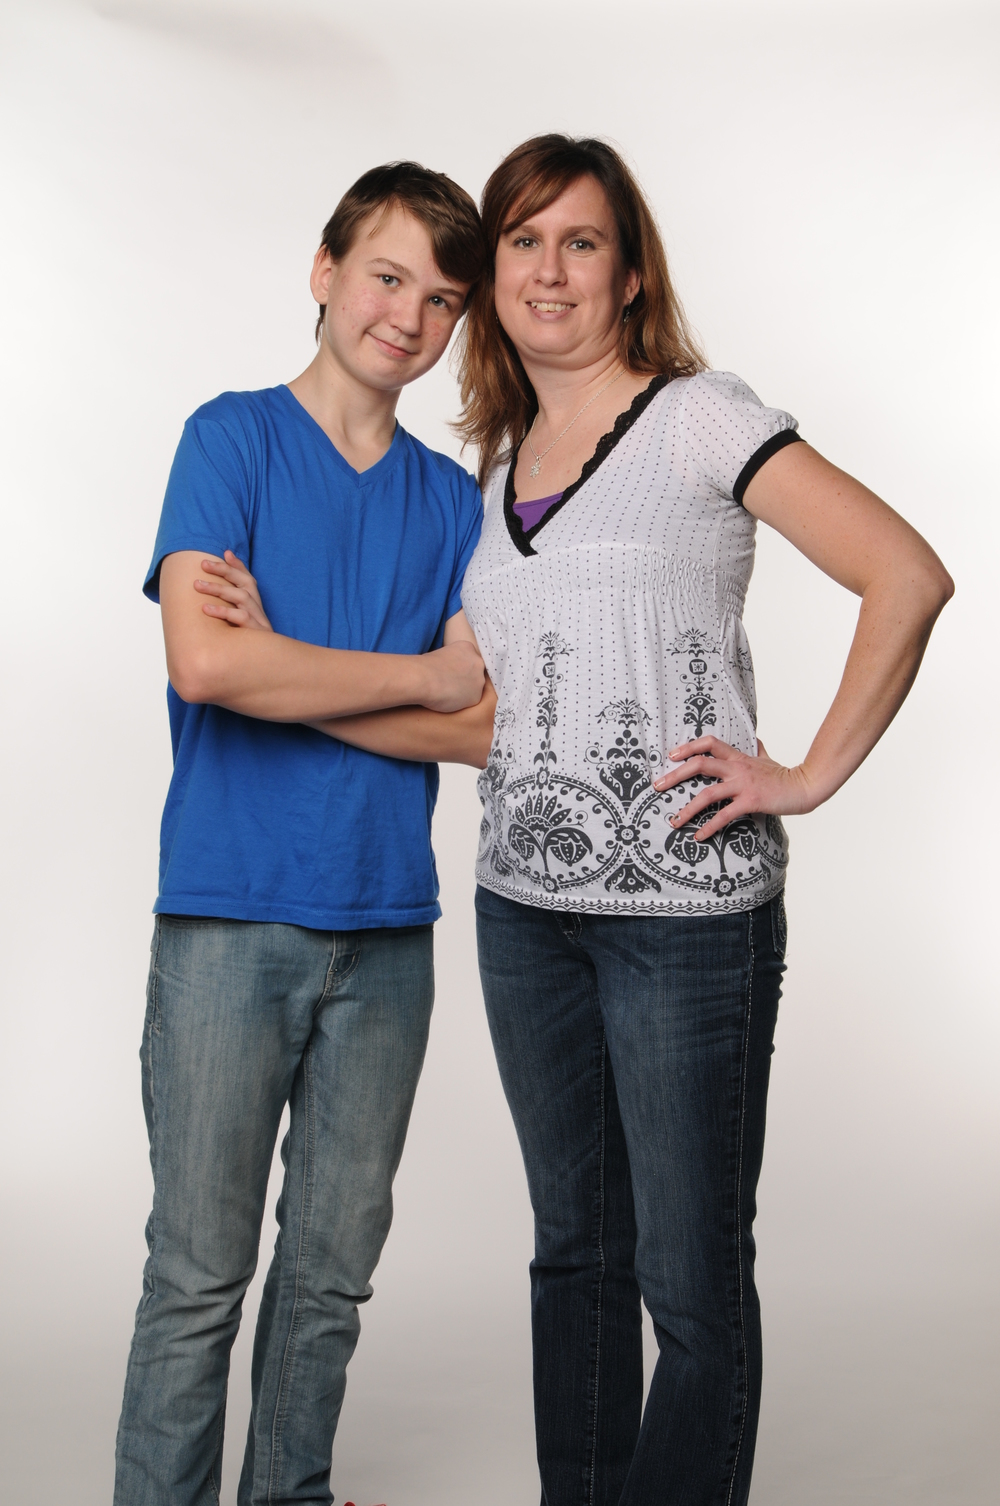 Trace and Brenda